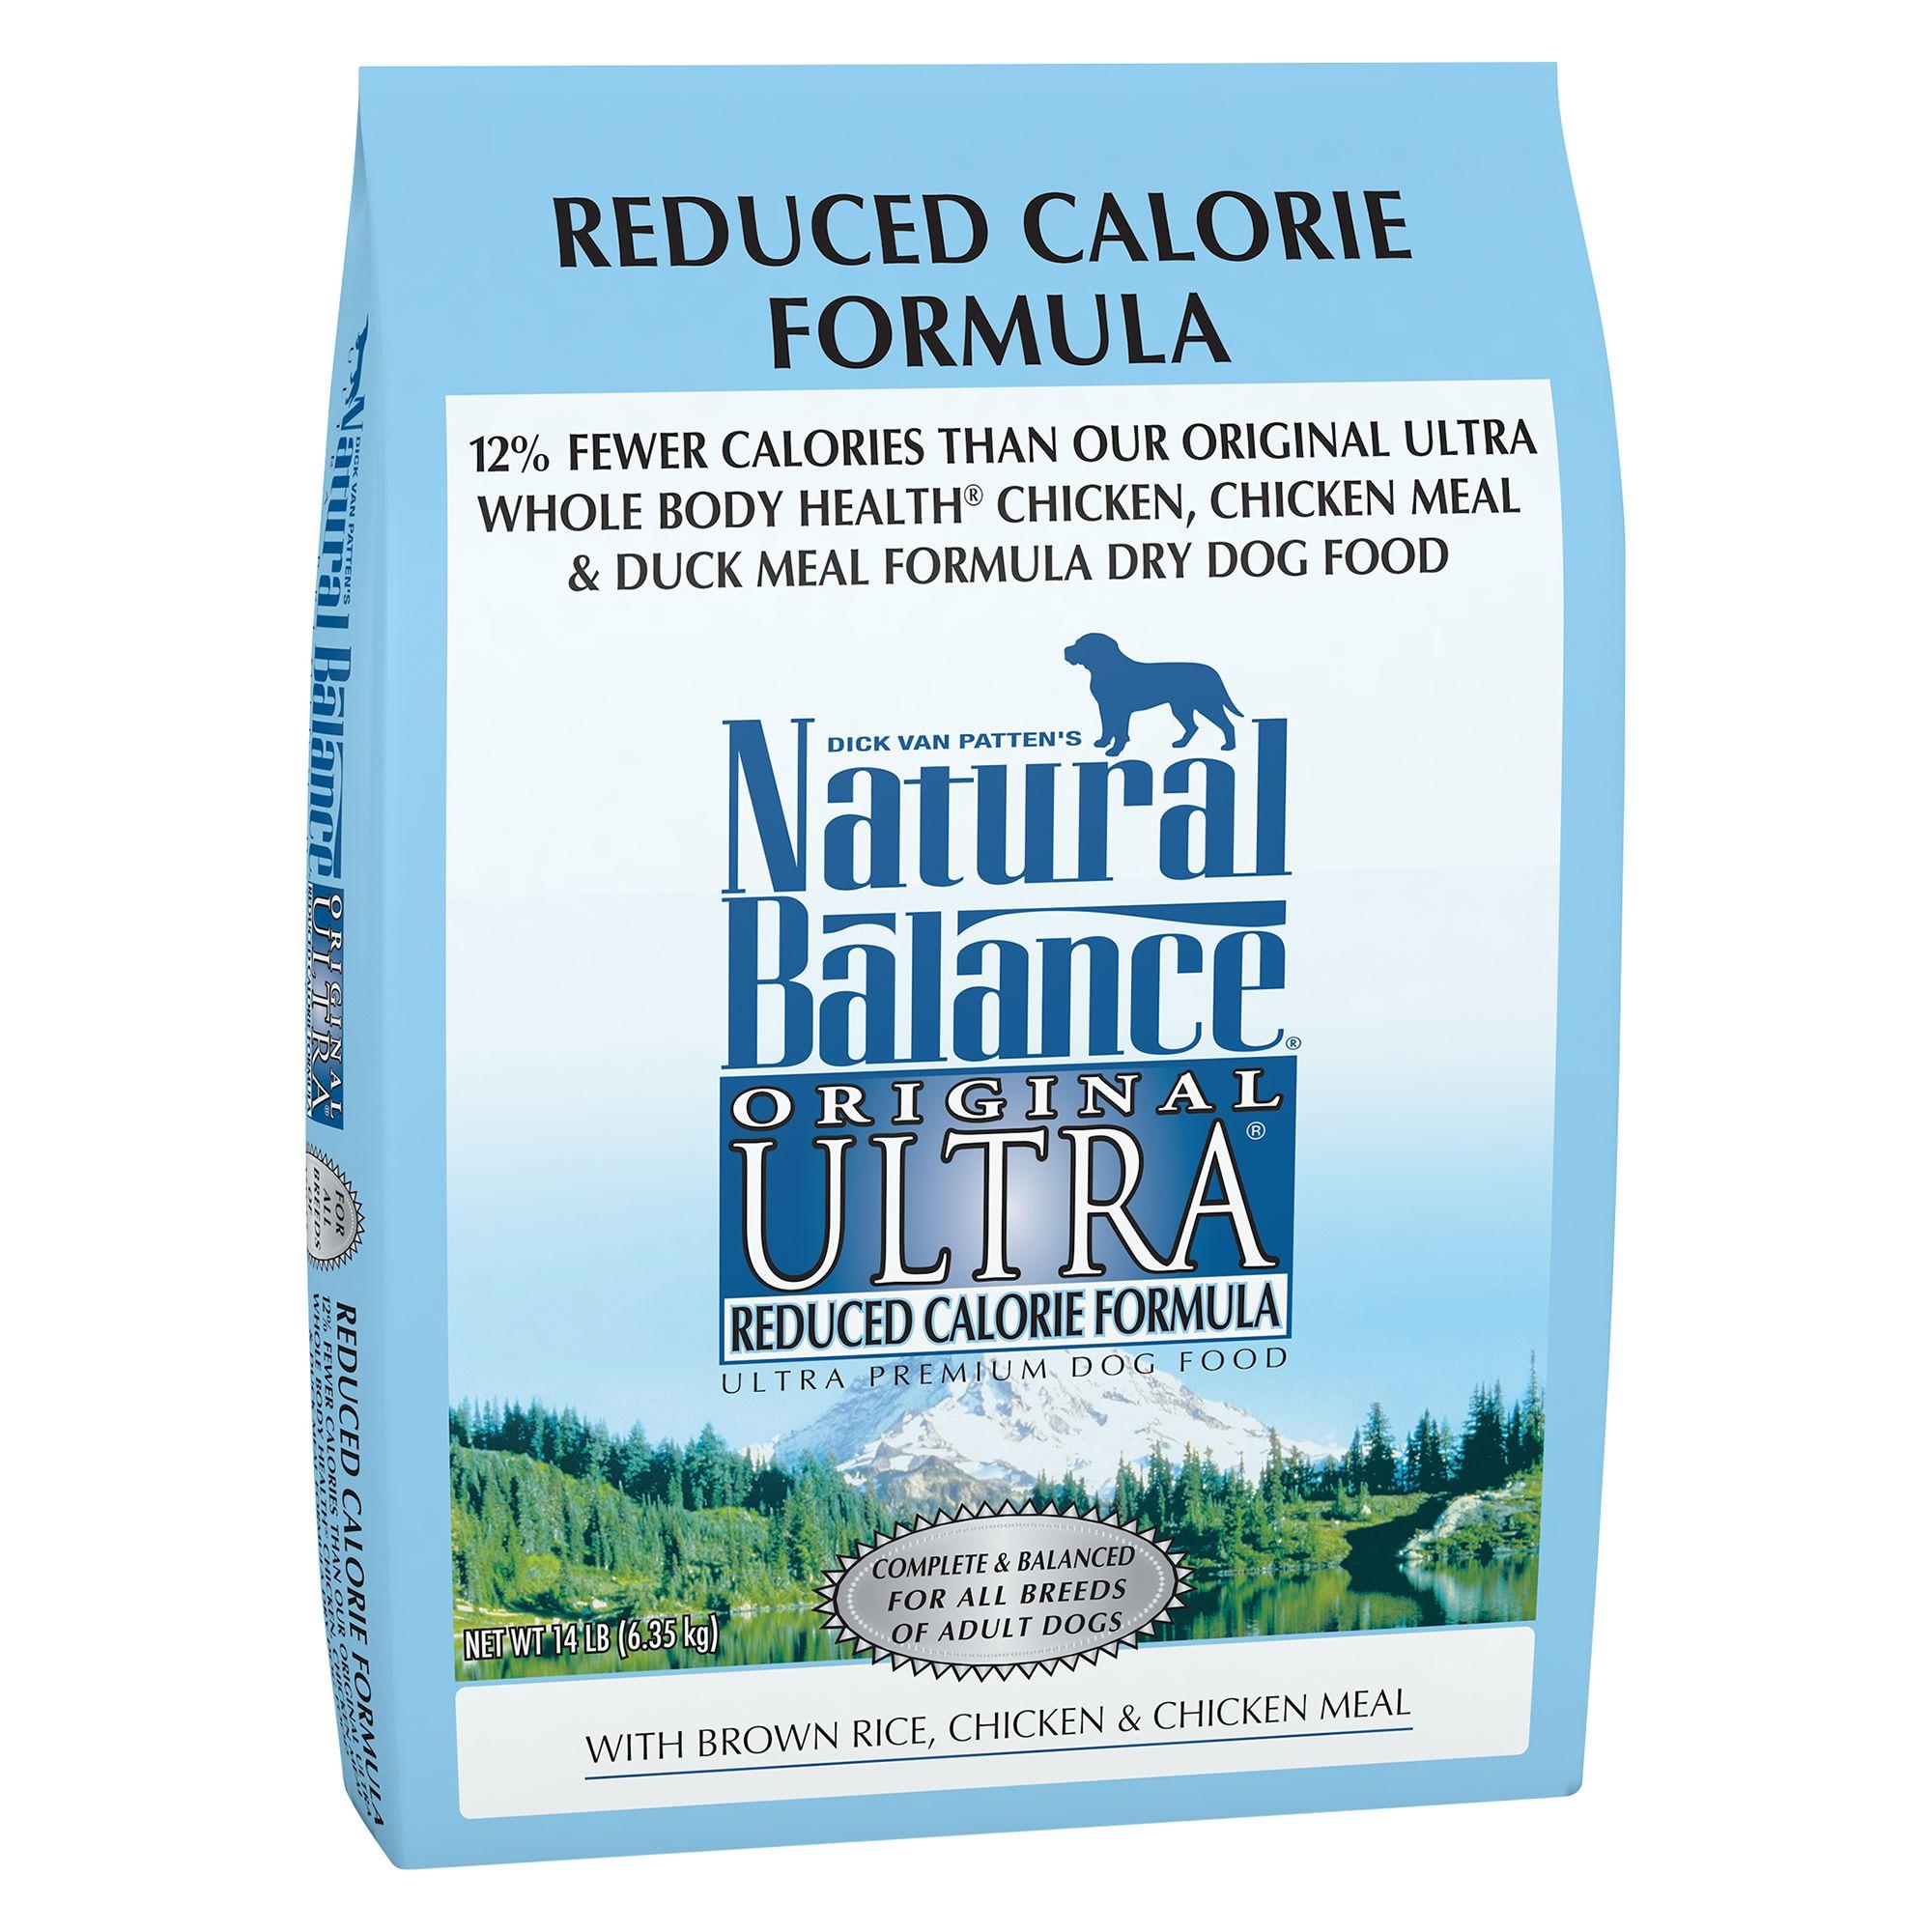 Natural Balance Original Ultra Reduced Calorie Formula Adult Dog Food size: 14 Lb, Chicken, Kibble, Brown Rice 5234854